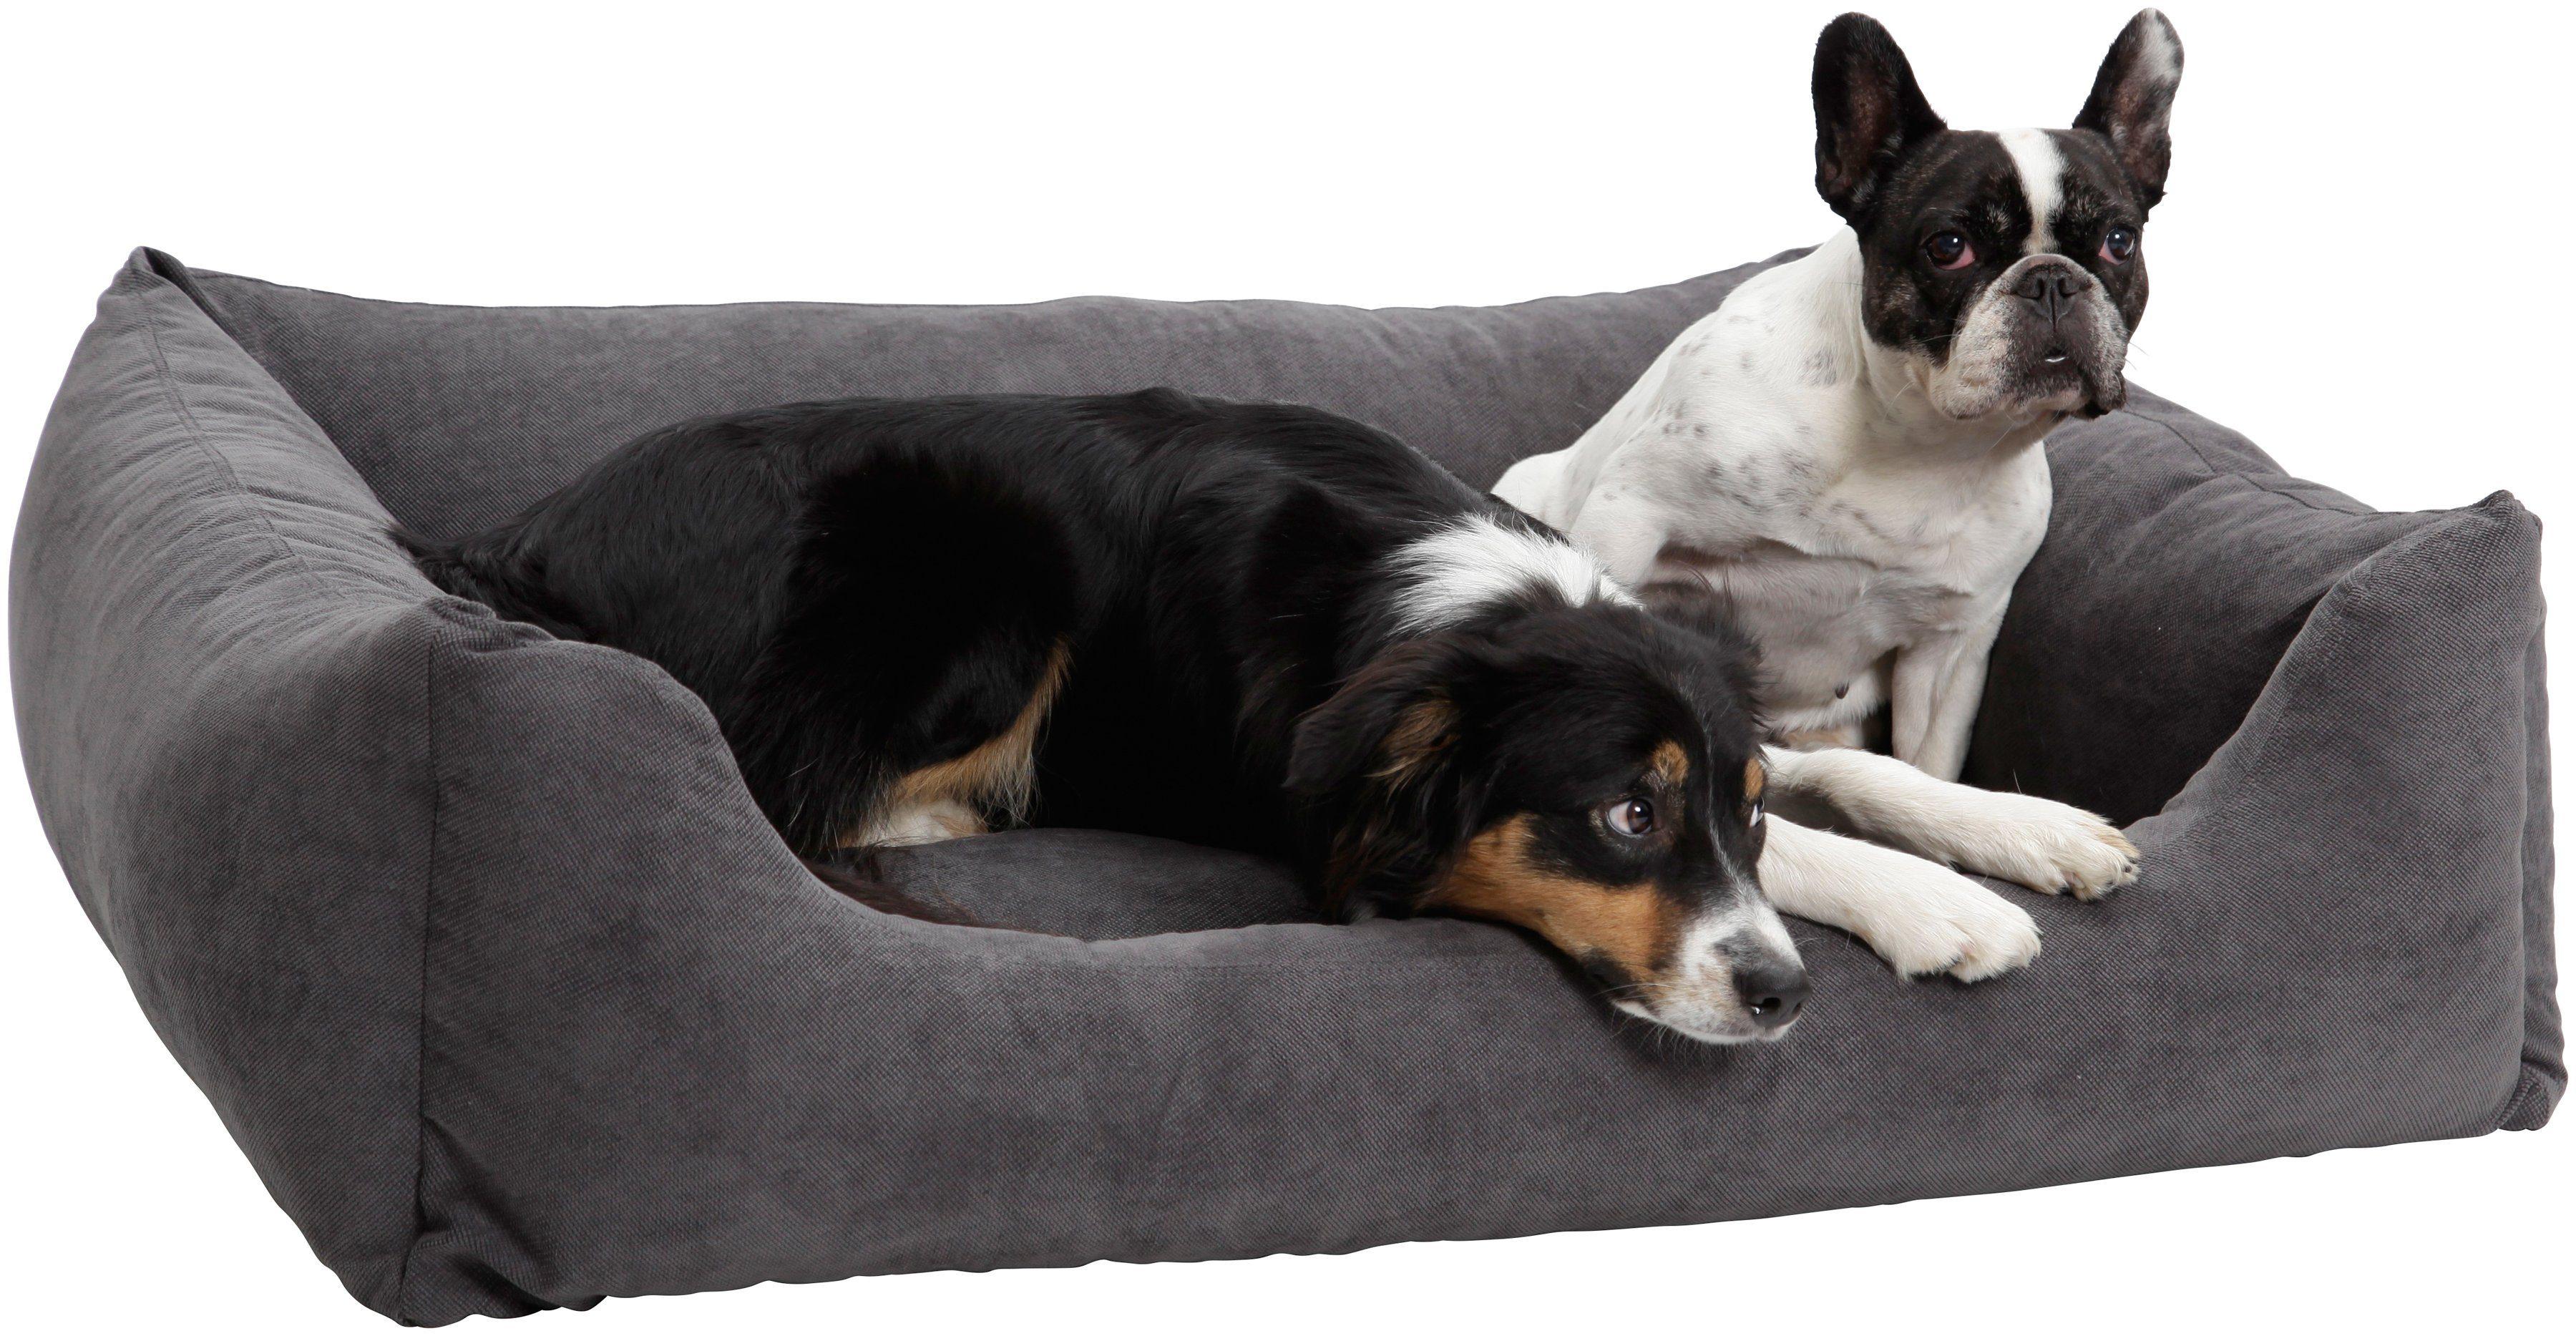 Dogs In The City Hundebett und Katzenbett »Madison«, B/T/H: 100/80/30 cm, Anthrazit